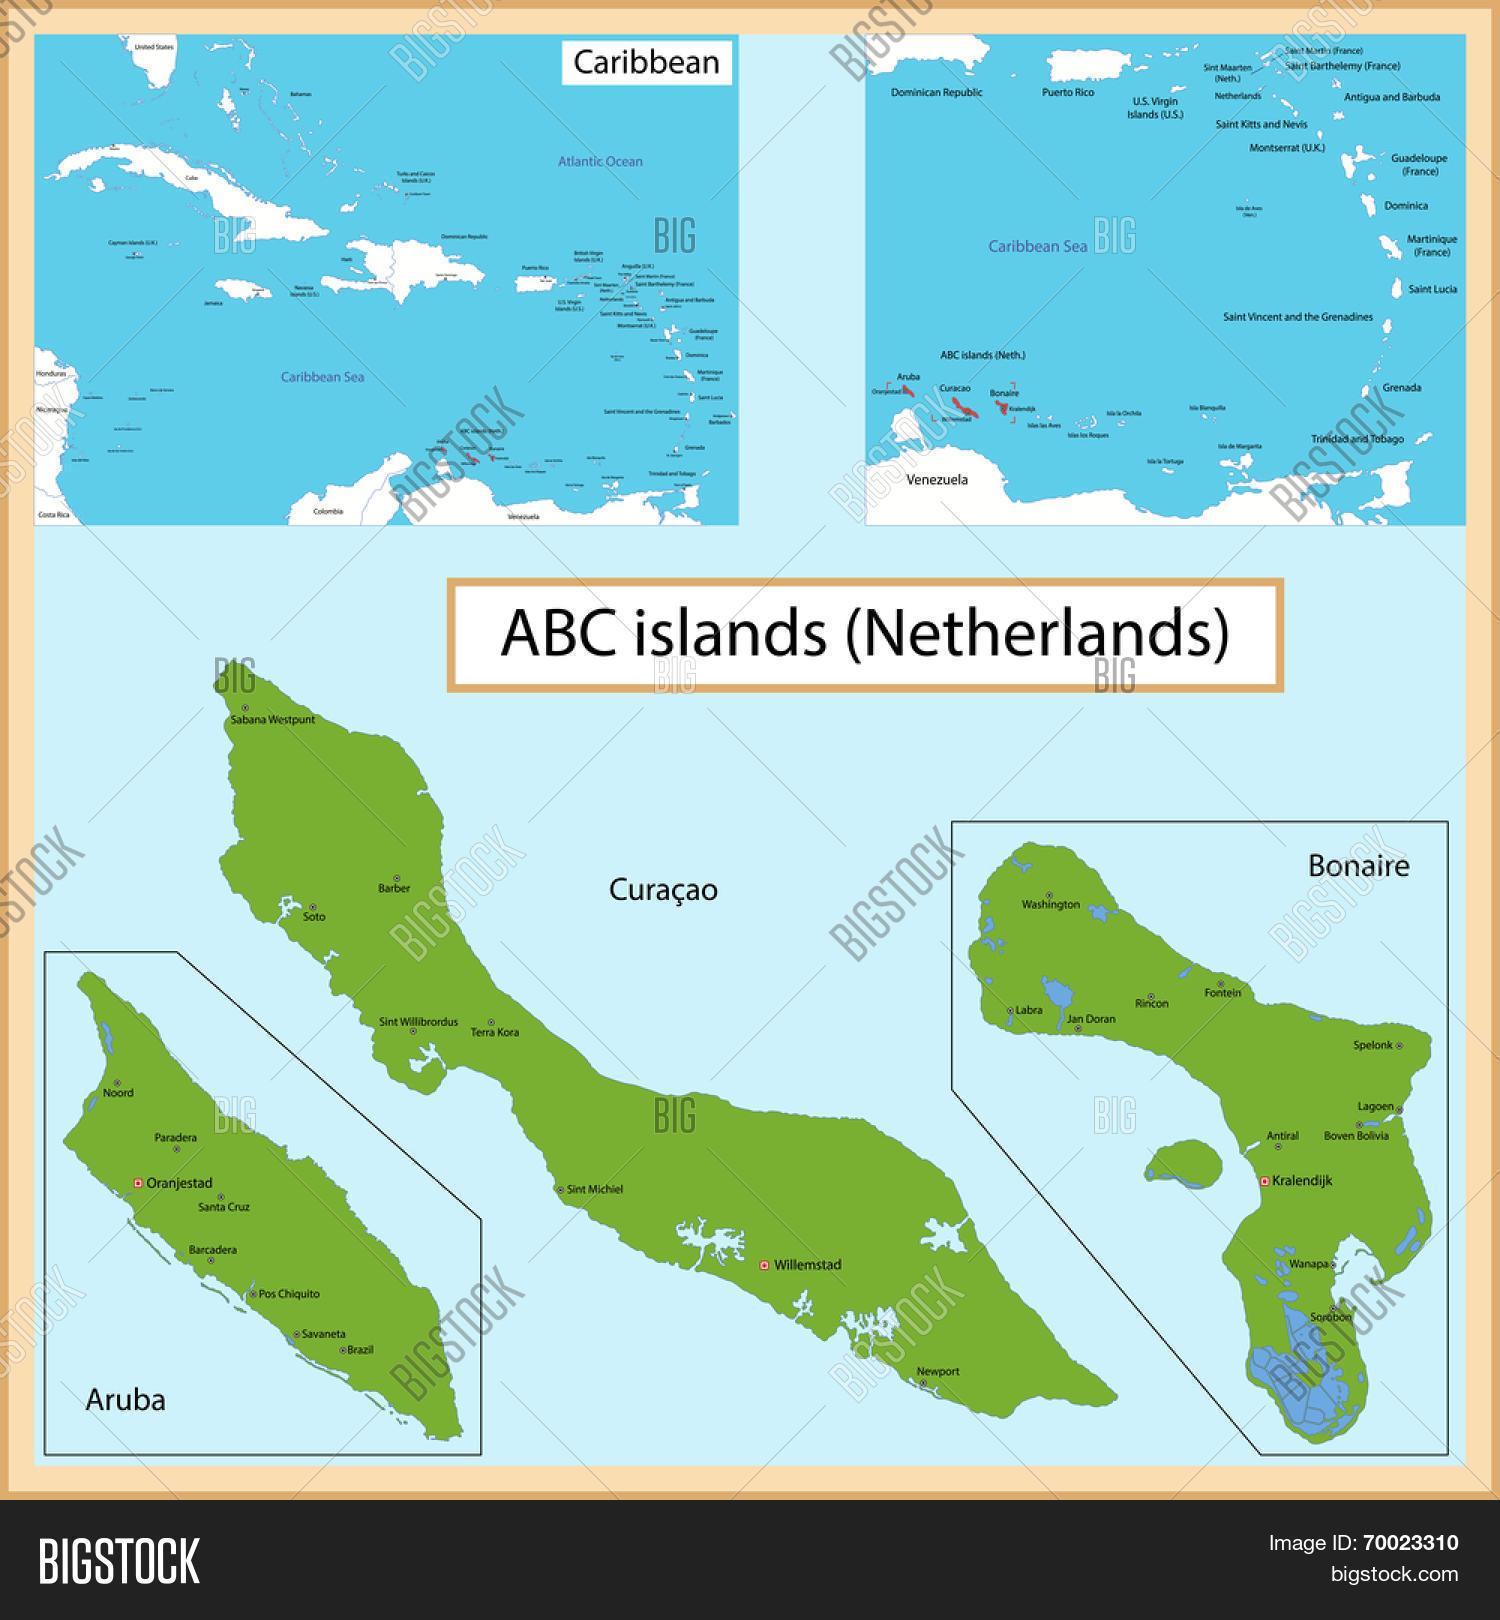 tunisia map, cameroon map, greater antilles map, angola map, st. thomas map, virgin islands map, saba map, santa barbara map, libya map, jamaica map, korea map, mexico map, eritrea map, carribean map, madagascar map, netherlands map, senegal map, mozambique map, united states map, antigua map, lesotho map, algeria map, caribbean map, st. martin map, namibia map, dominican republic map, kenya map, burundi map, sudan map, puerto rico map, ghana map, ethiopia map, rwanda map, zimbabwe map, morocco map, peru map, egypt map, niger map, on map aruba